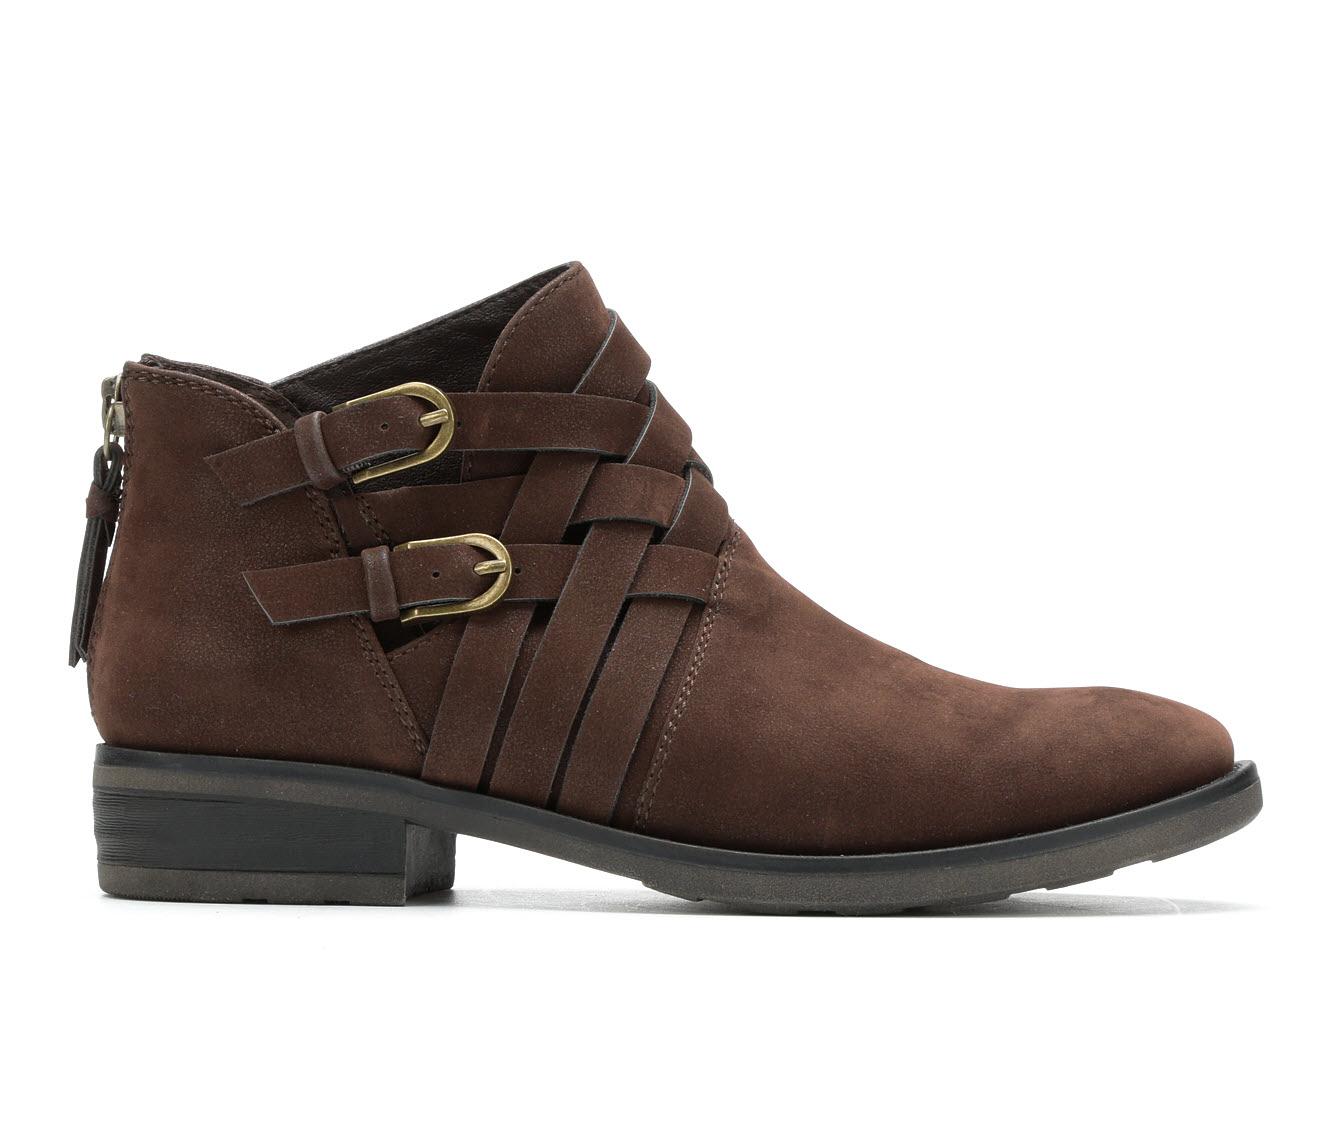 Baretraps Atticus Women's Boot (Brown Faux Leather)